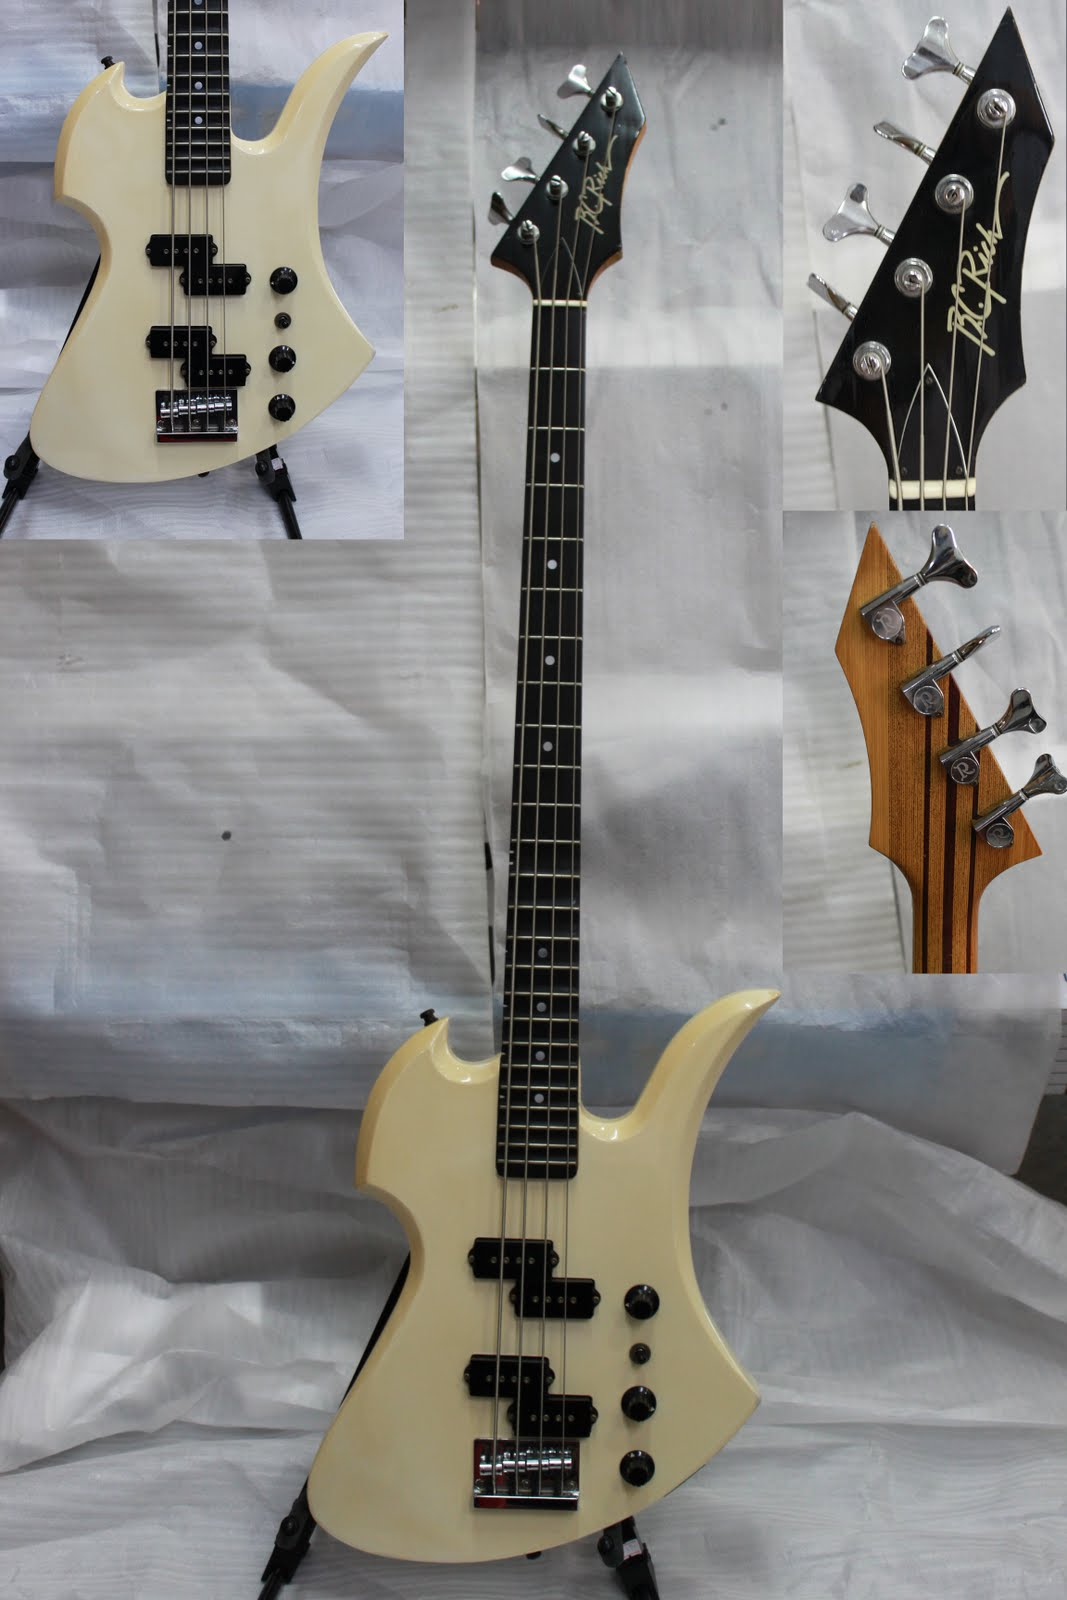 b c rich mockingbird bass usa model year late 1980s  [ 1067 x 1600 Pixel ]